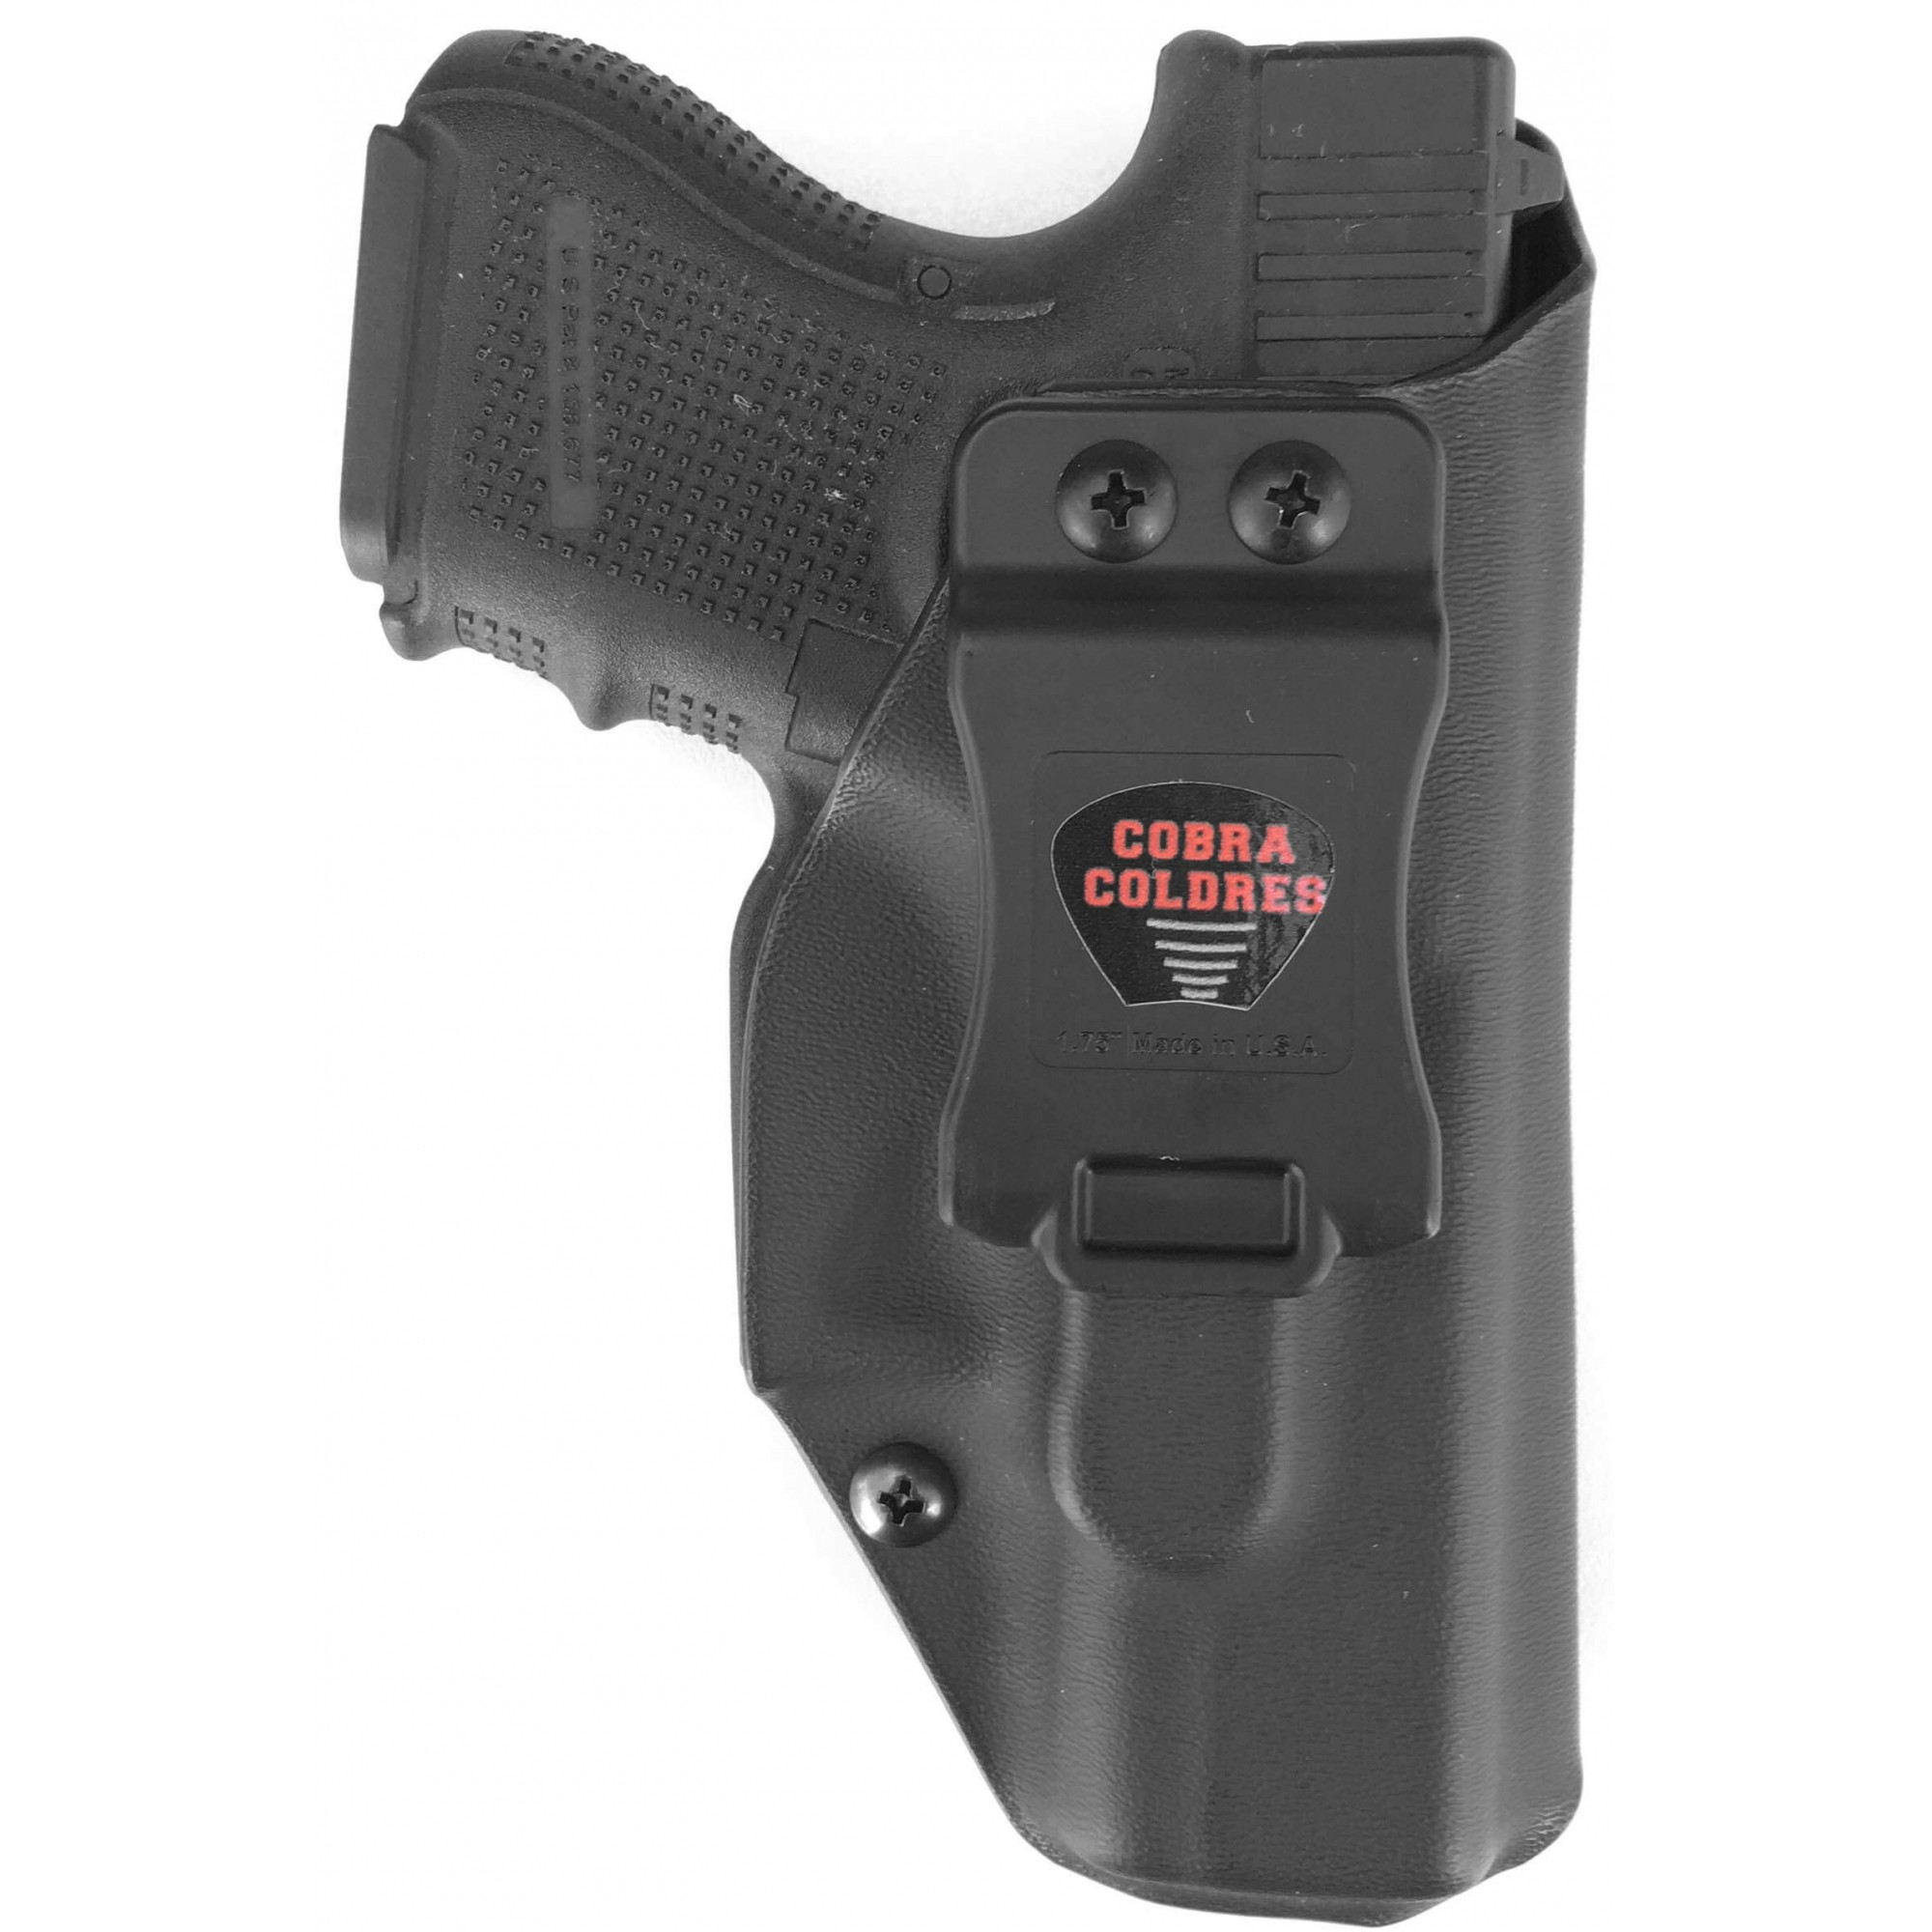 Coldre Glock [G30] [G29] Kydex + 1 Porta-Carregador Universal - Saque Rápido Velado Kydex® 080